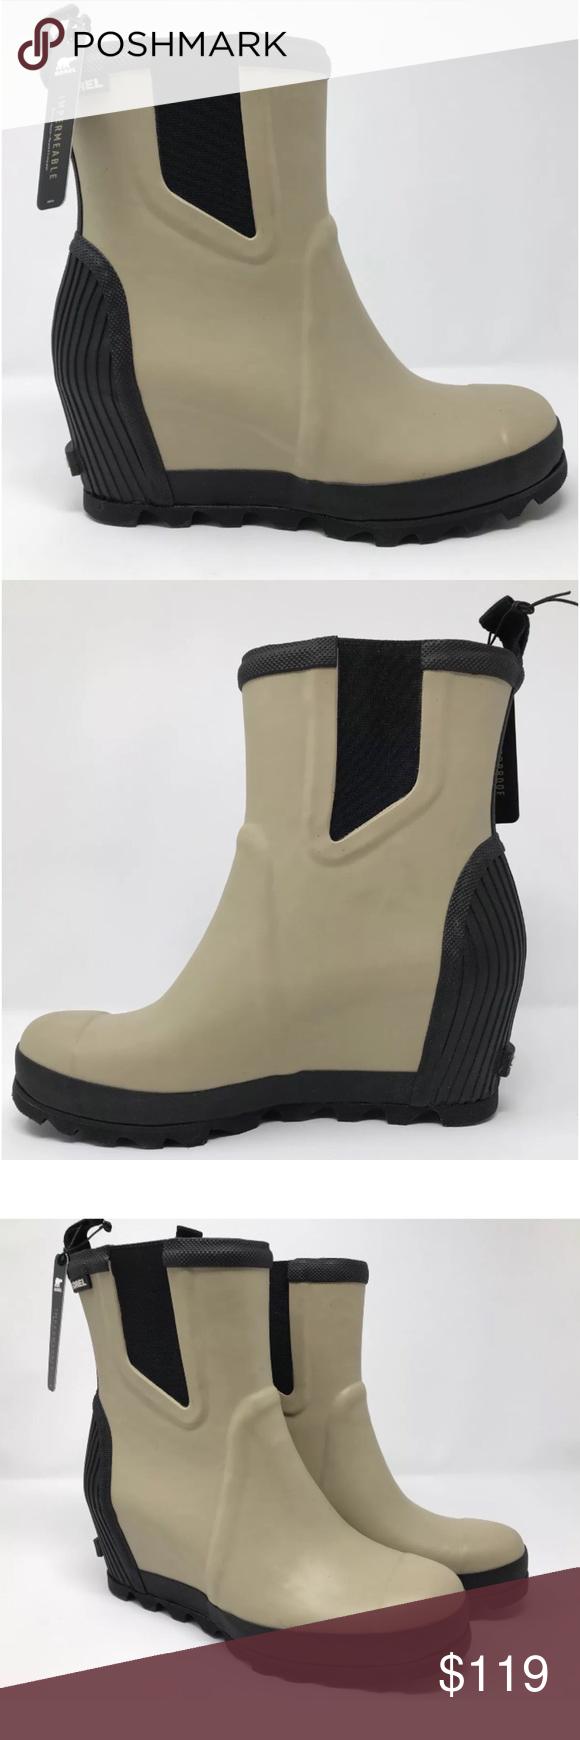 Sorel Joan Rain Wedge Chelsea Boots